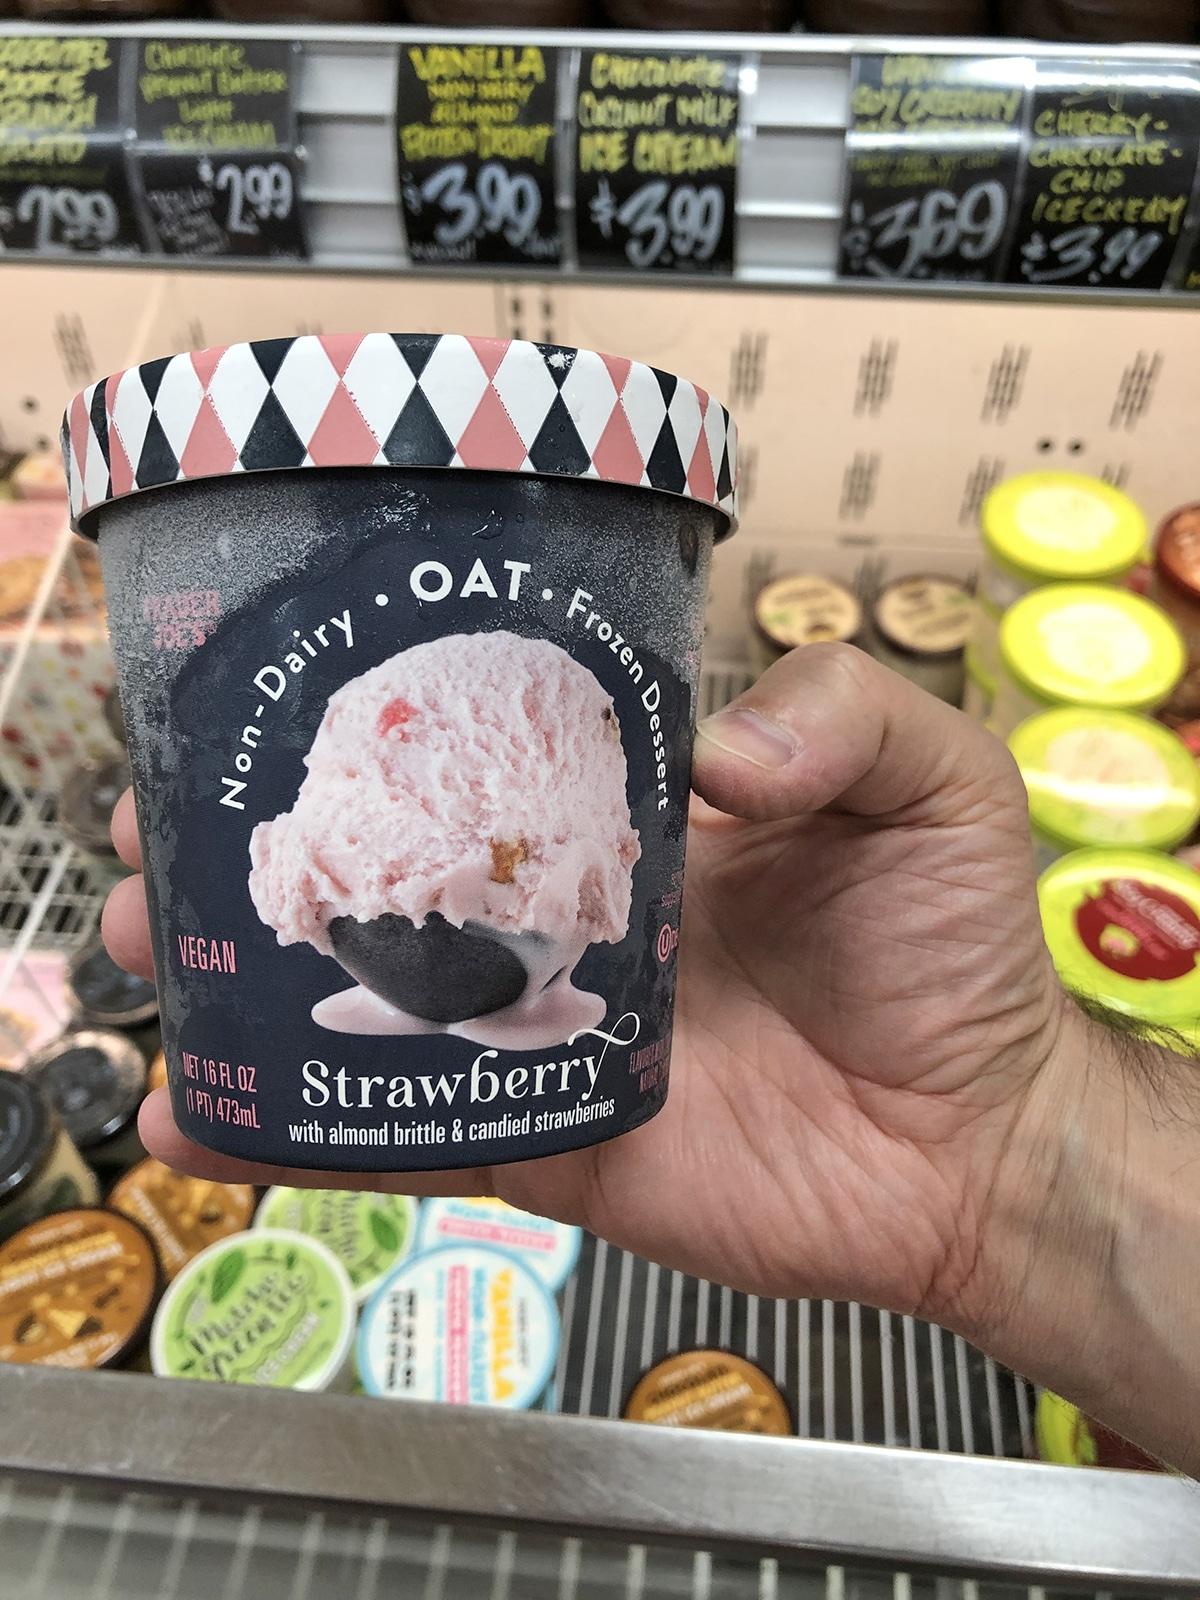 Hand holding strawberry ice cream.